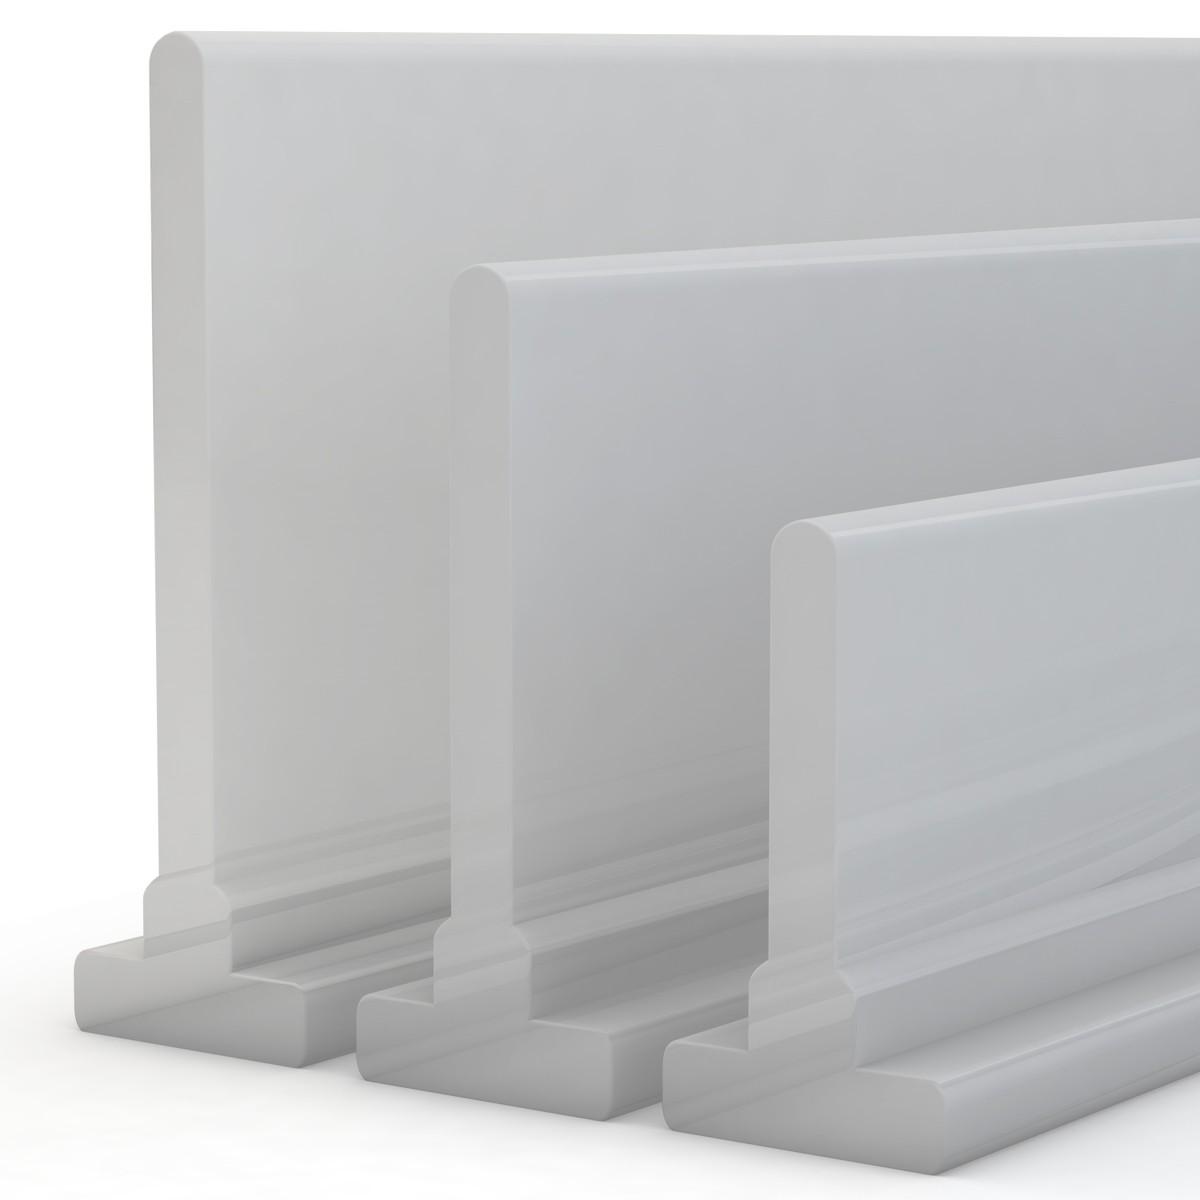 duschkabinen dichtung sdd02 duschdichtung silikon. Black Bedroom Furniture Sets. Home Design Ideas